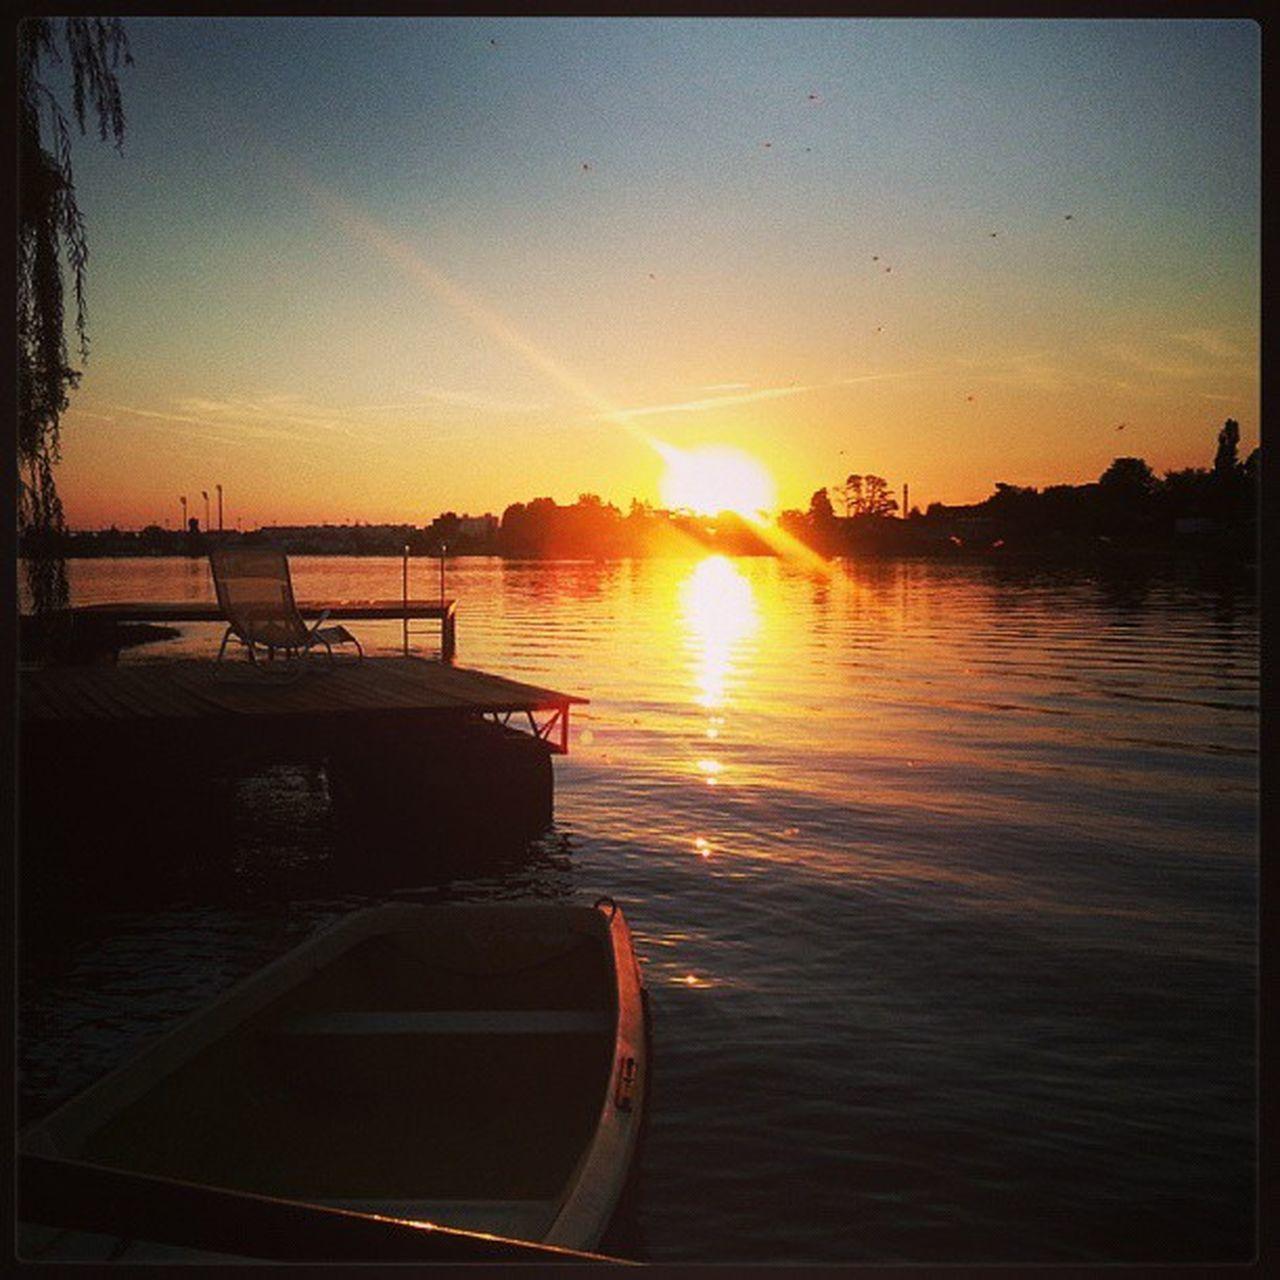 Sunset at Slnecne Jazera Lakes  at Senec, Slovakia.